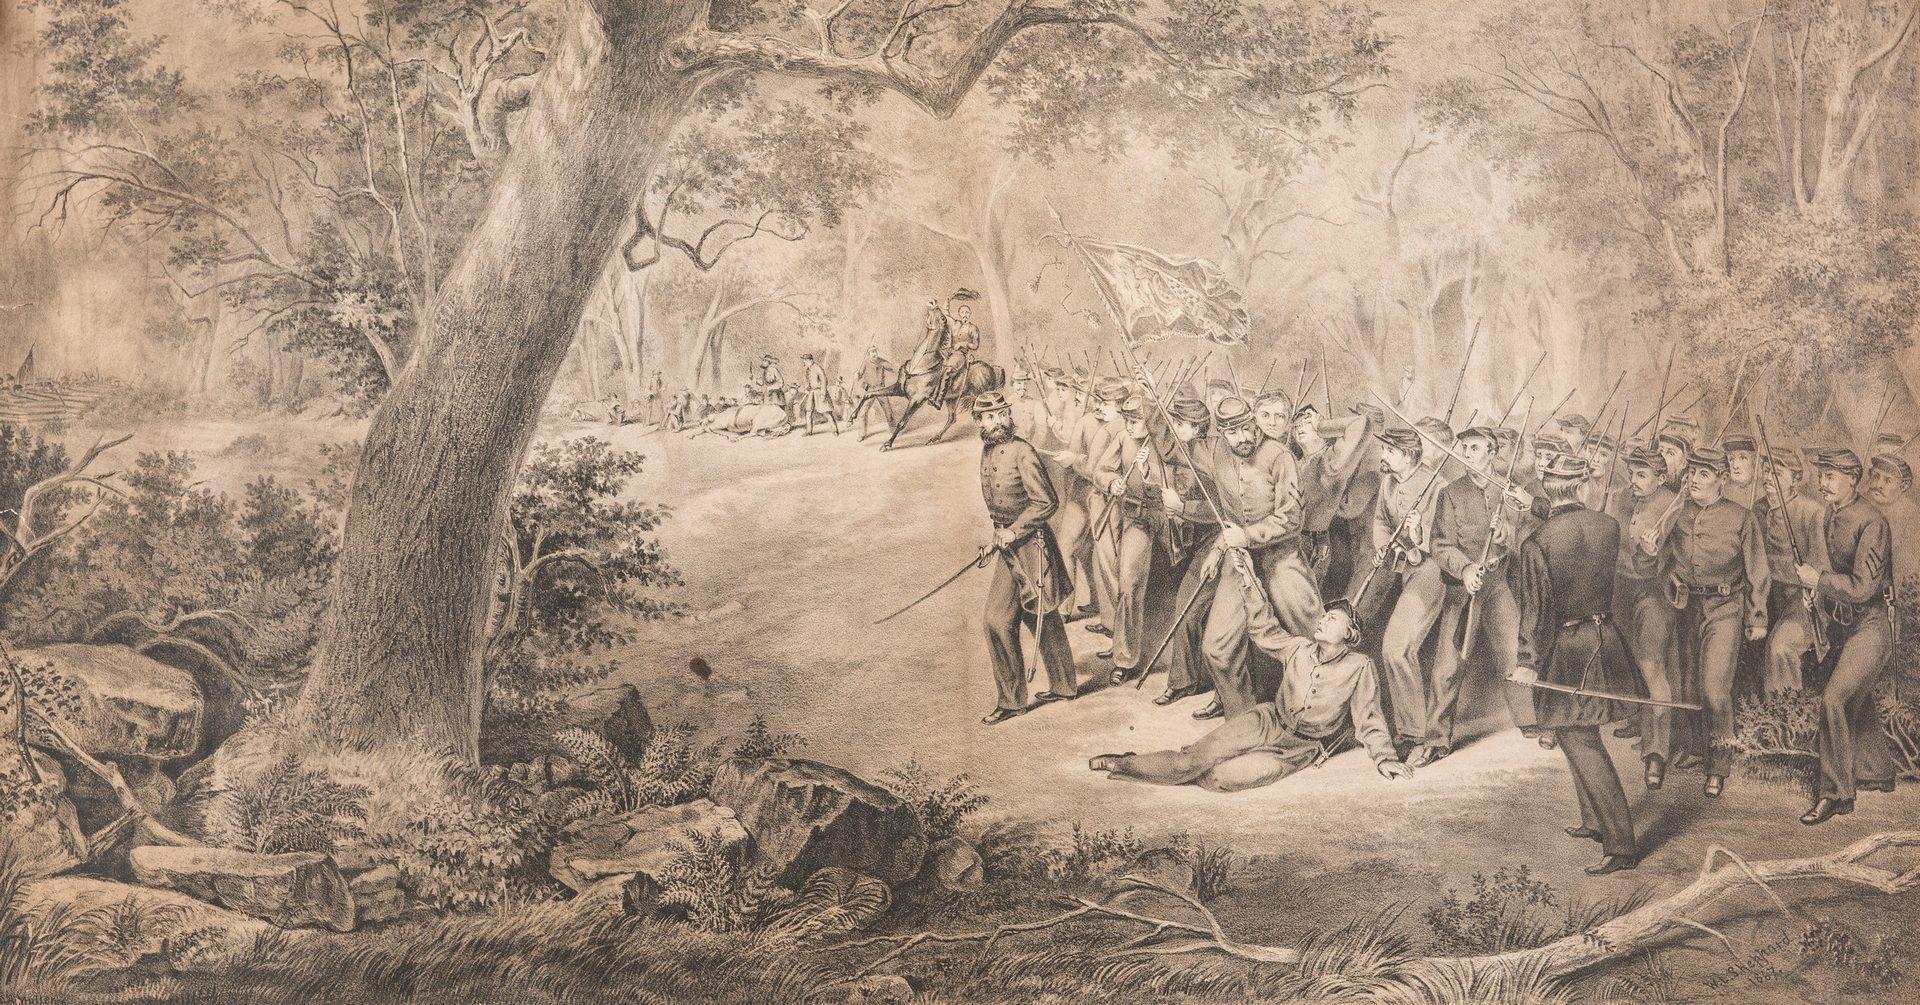 Lot 385: Civil War related CDVs, Signed Litho, Flag